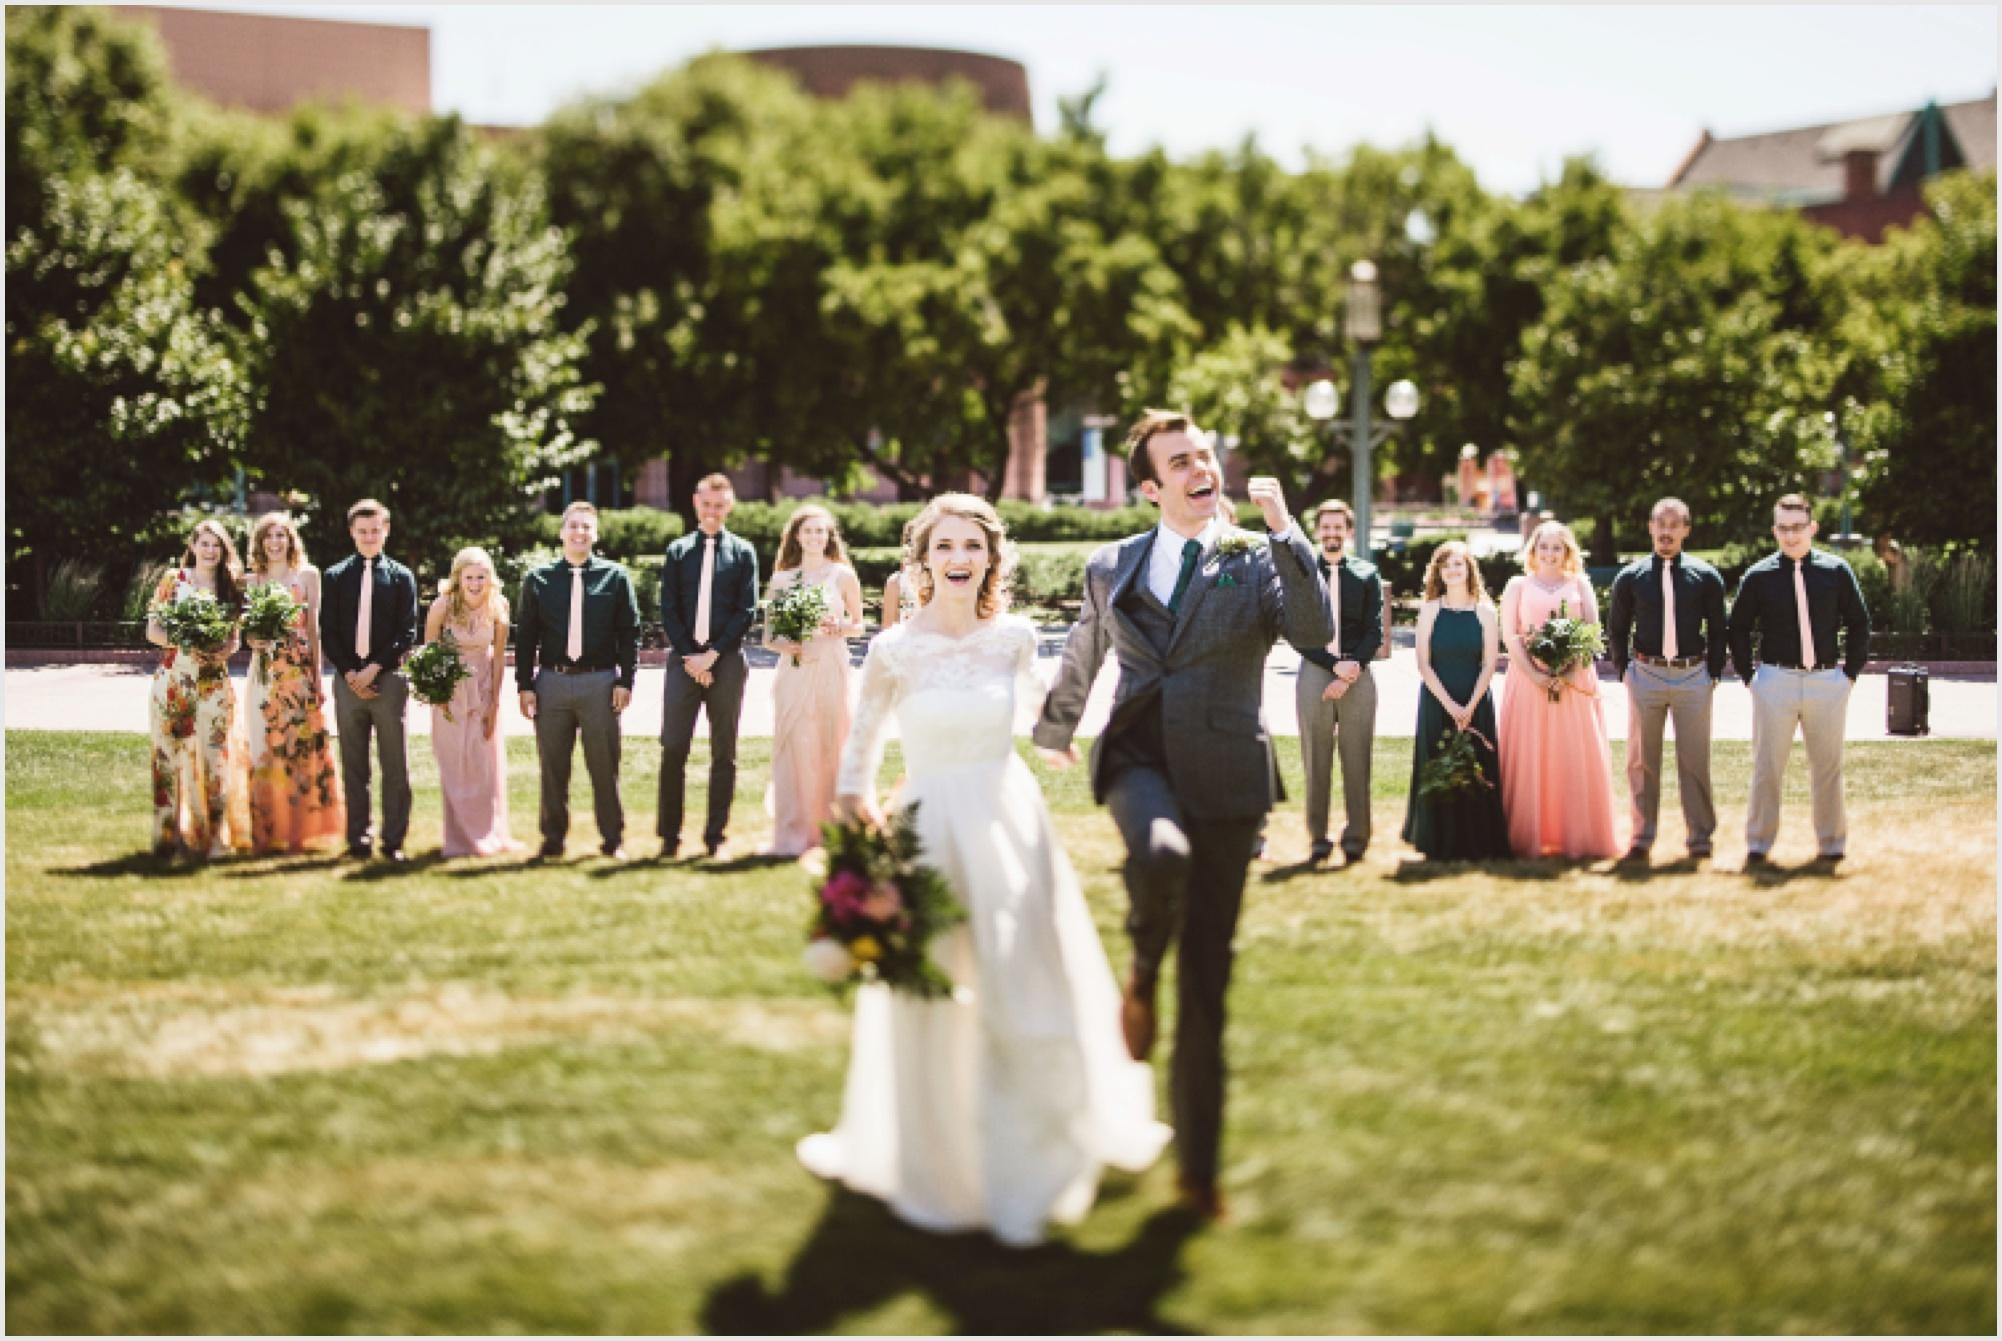 abby_taylor_minneapolis_wedding_lucas_botz_photography_146.jpg